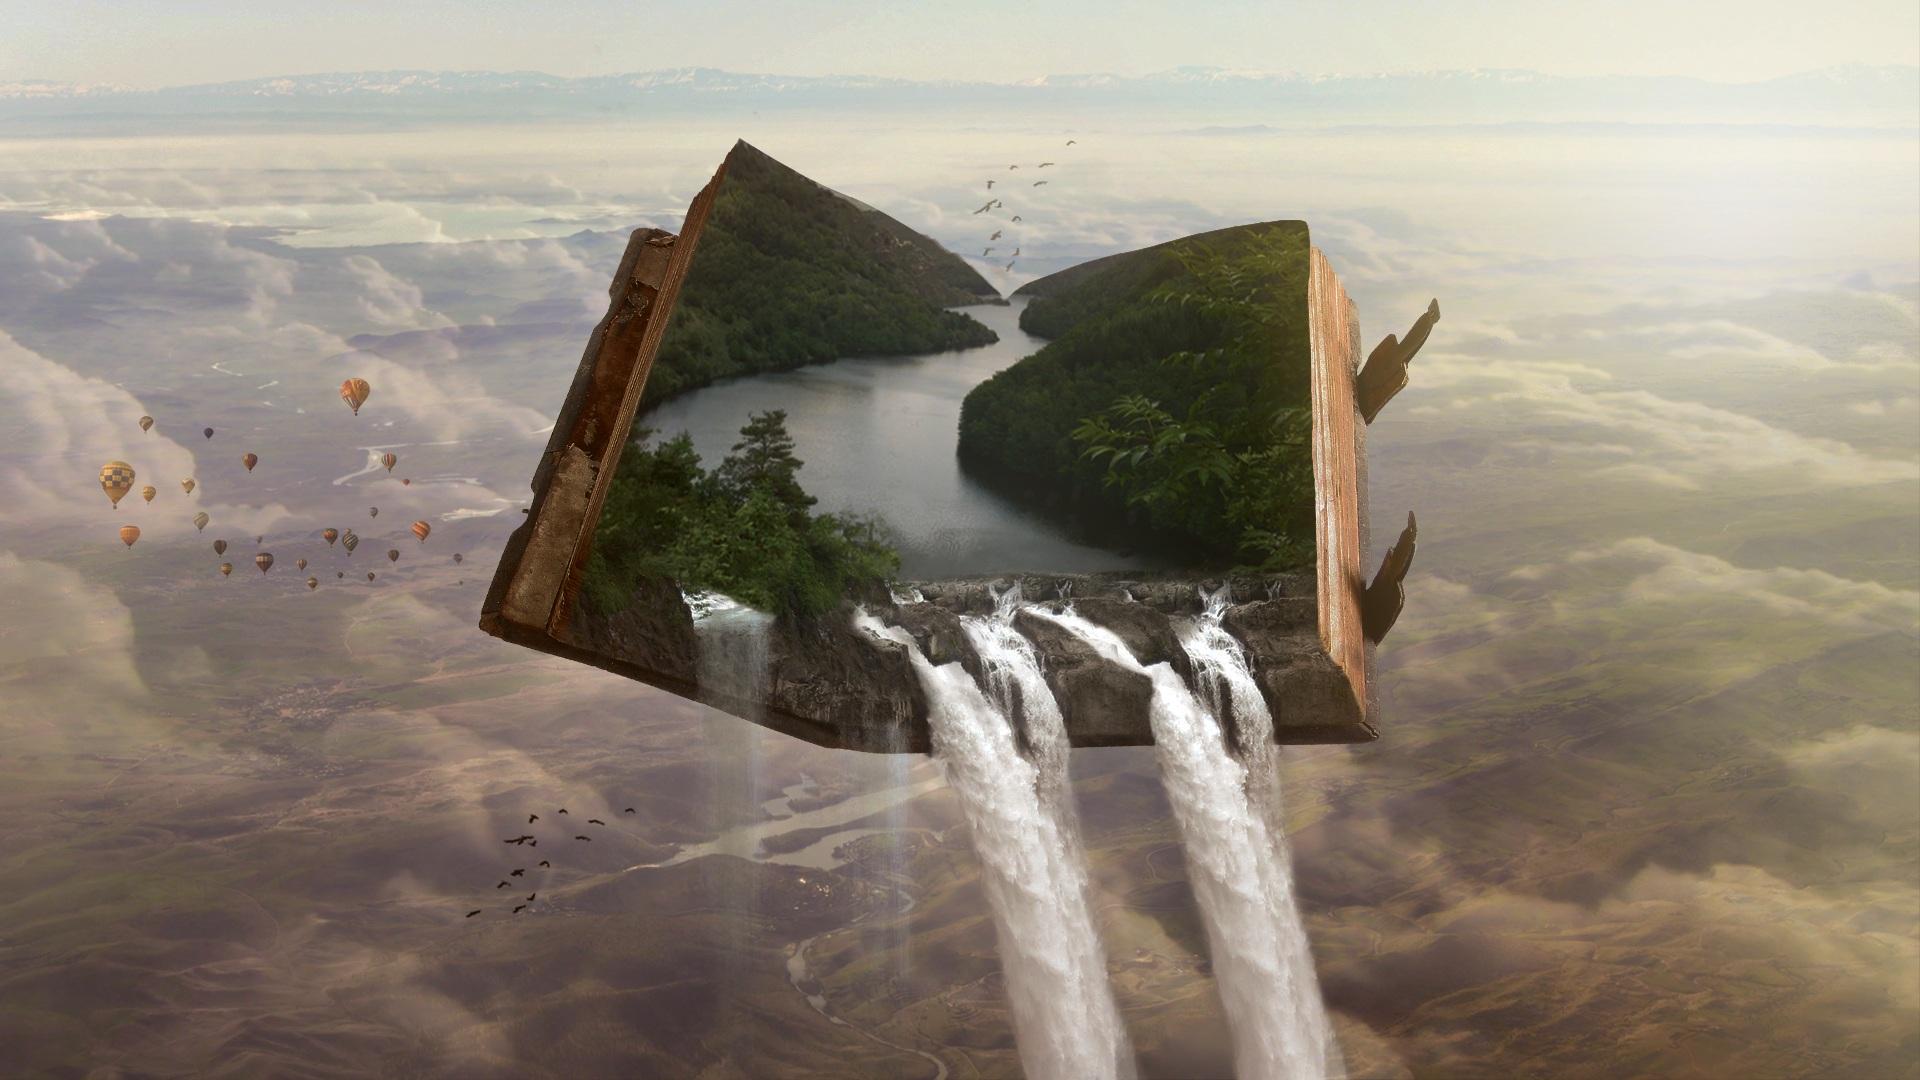 open book showing landscape in 3D